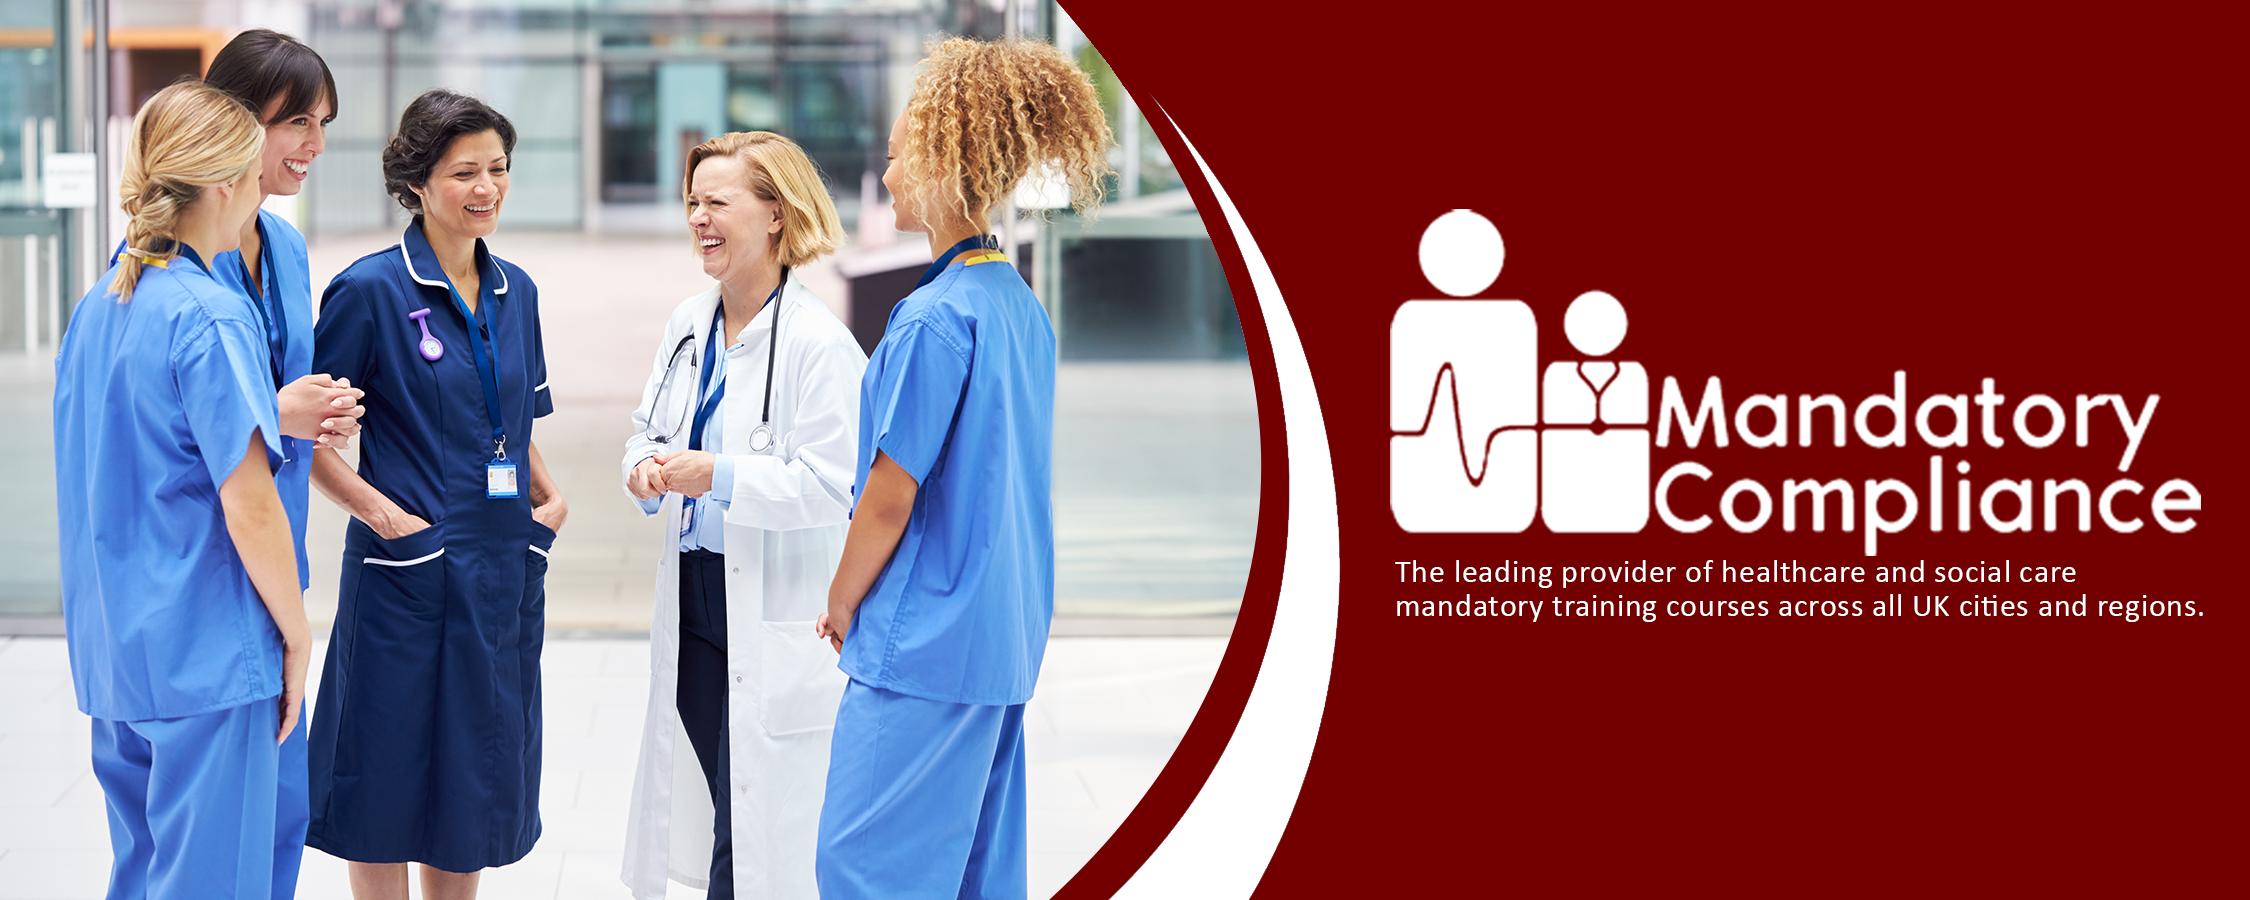 Mandatory Health and Social Care Training Courses - E-Learning Courses - Mandatory Compliance UK -